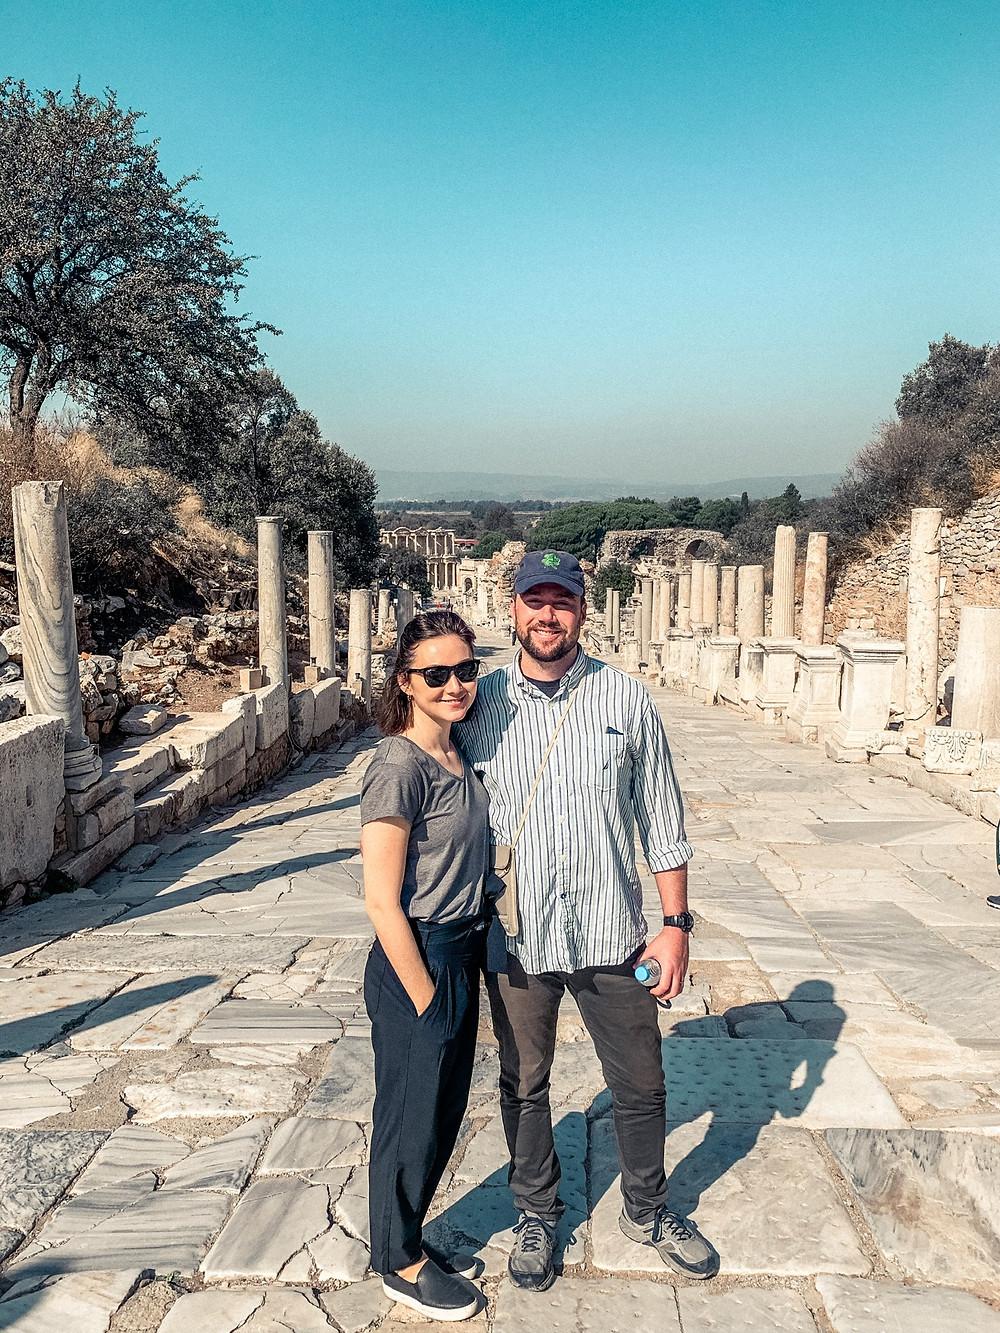 Looking down the main boulevard of ancient Ephesus